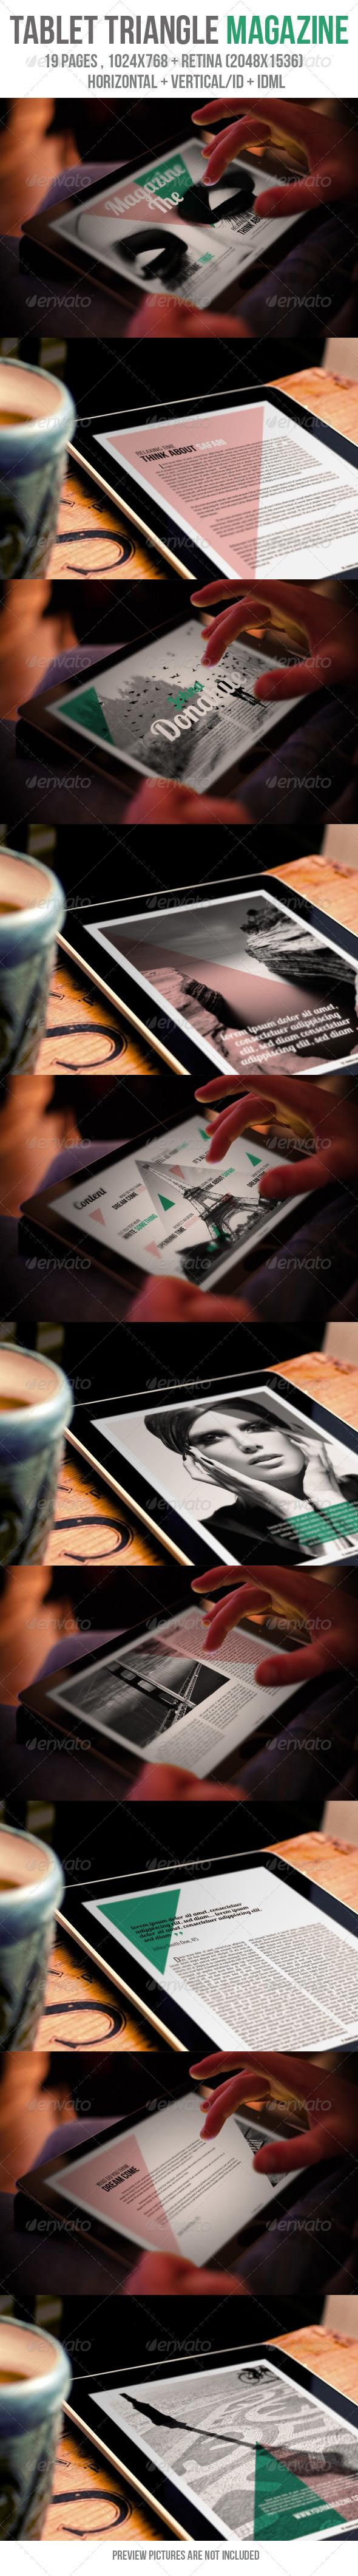 GraphicRiver Tablet Triangle Magazine 5837135